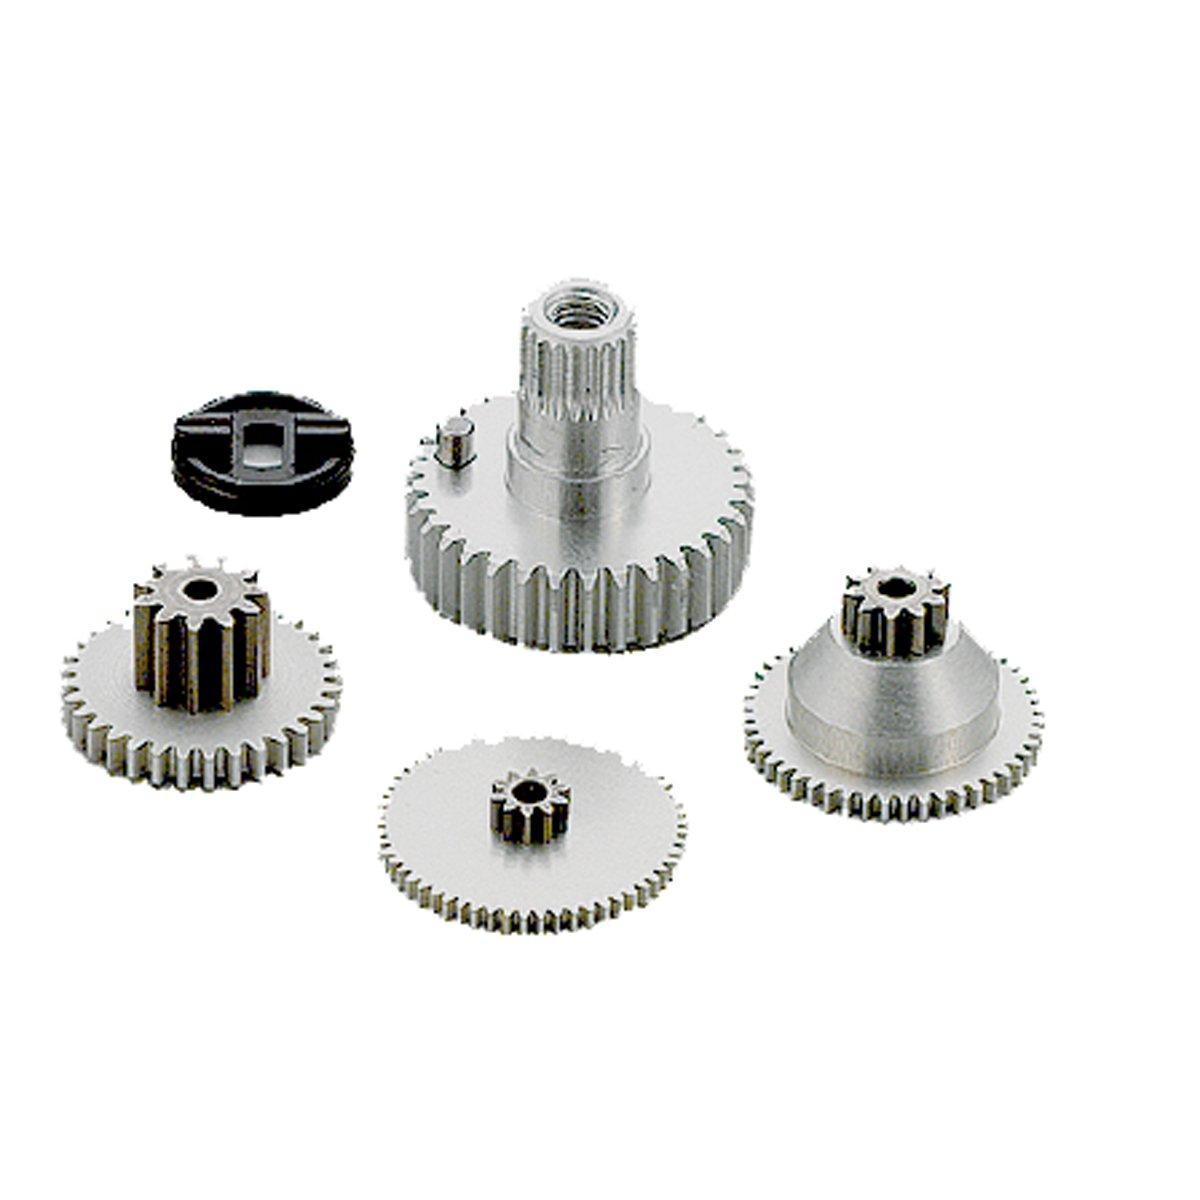 KO Propo Aluminum Gear Set RSx1//3-12